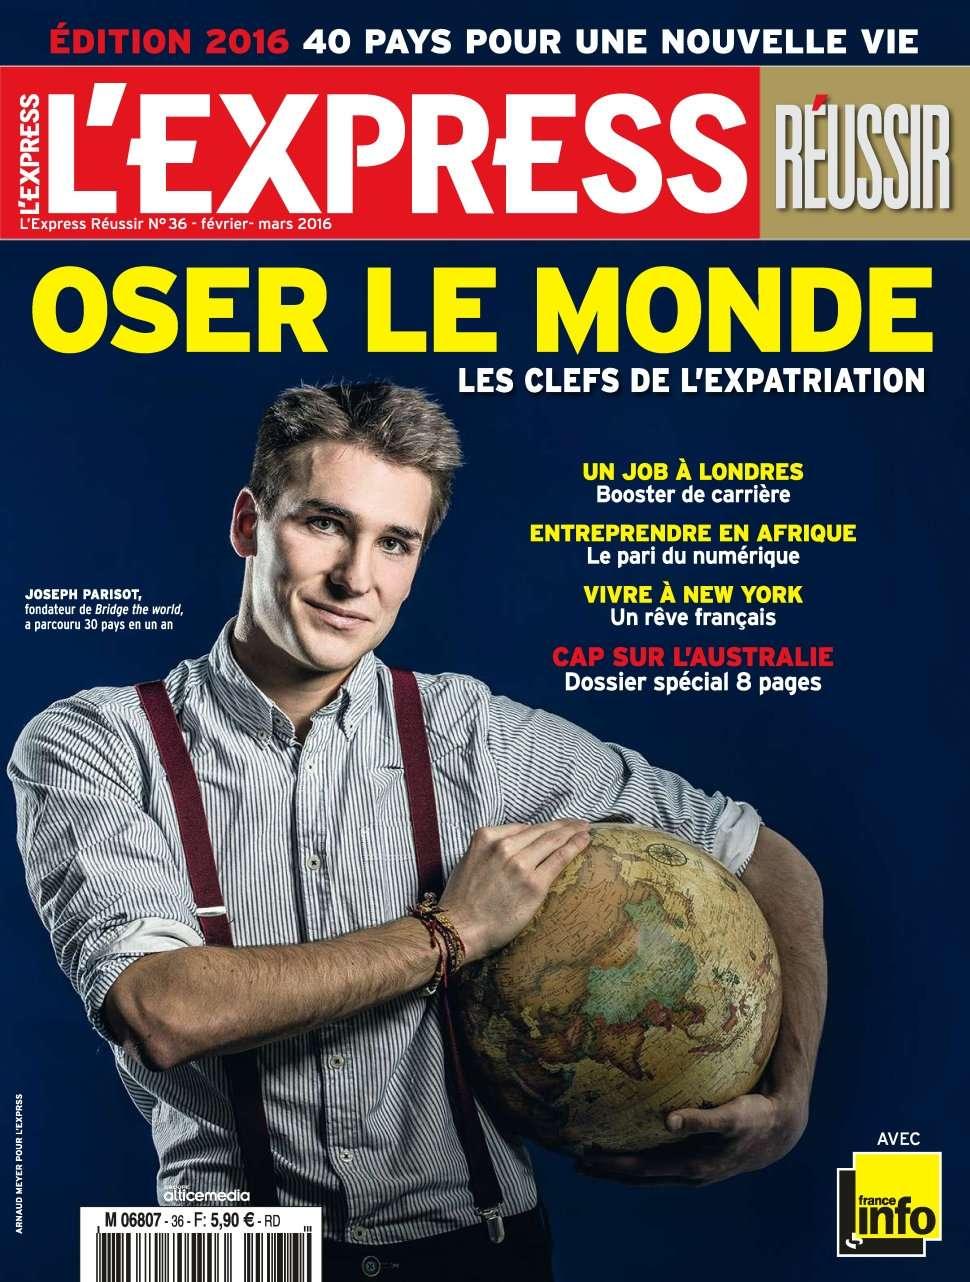 L'Express Hors-Série 49 - Février/Mars 2016